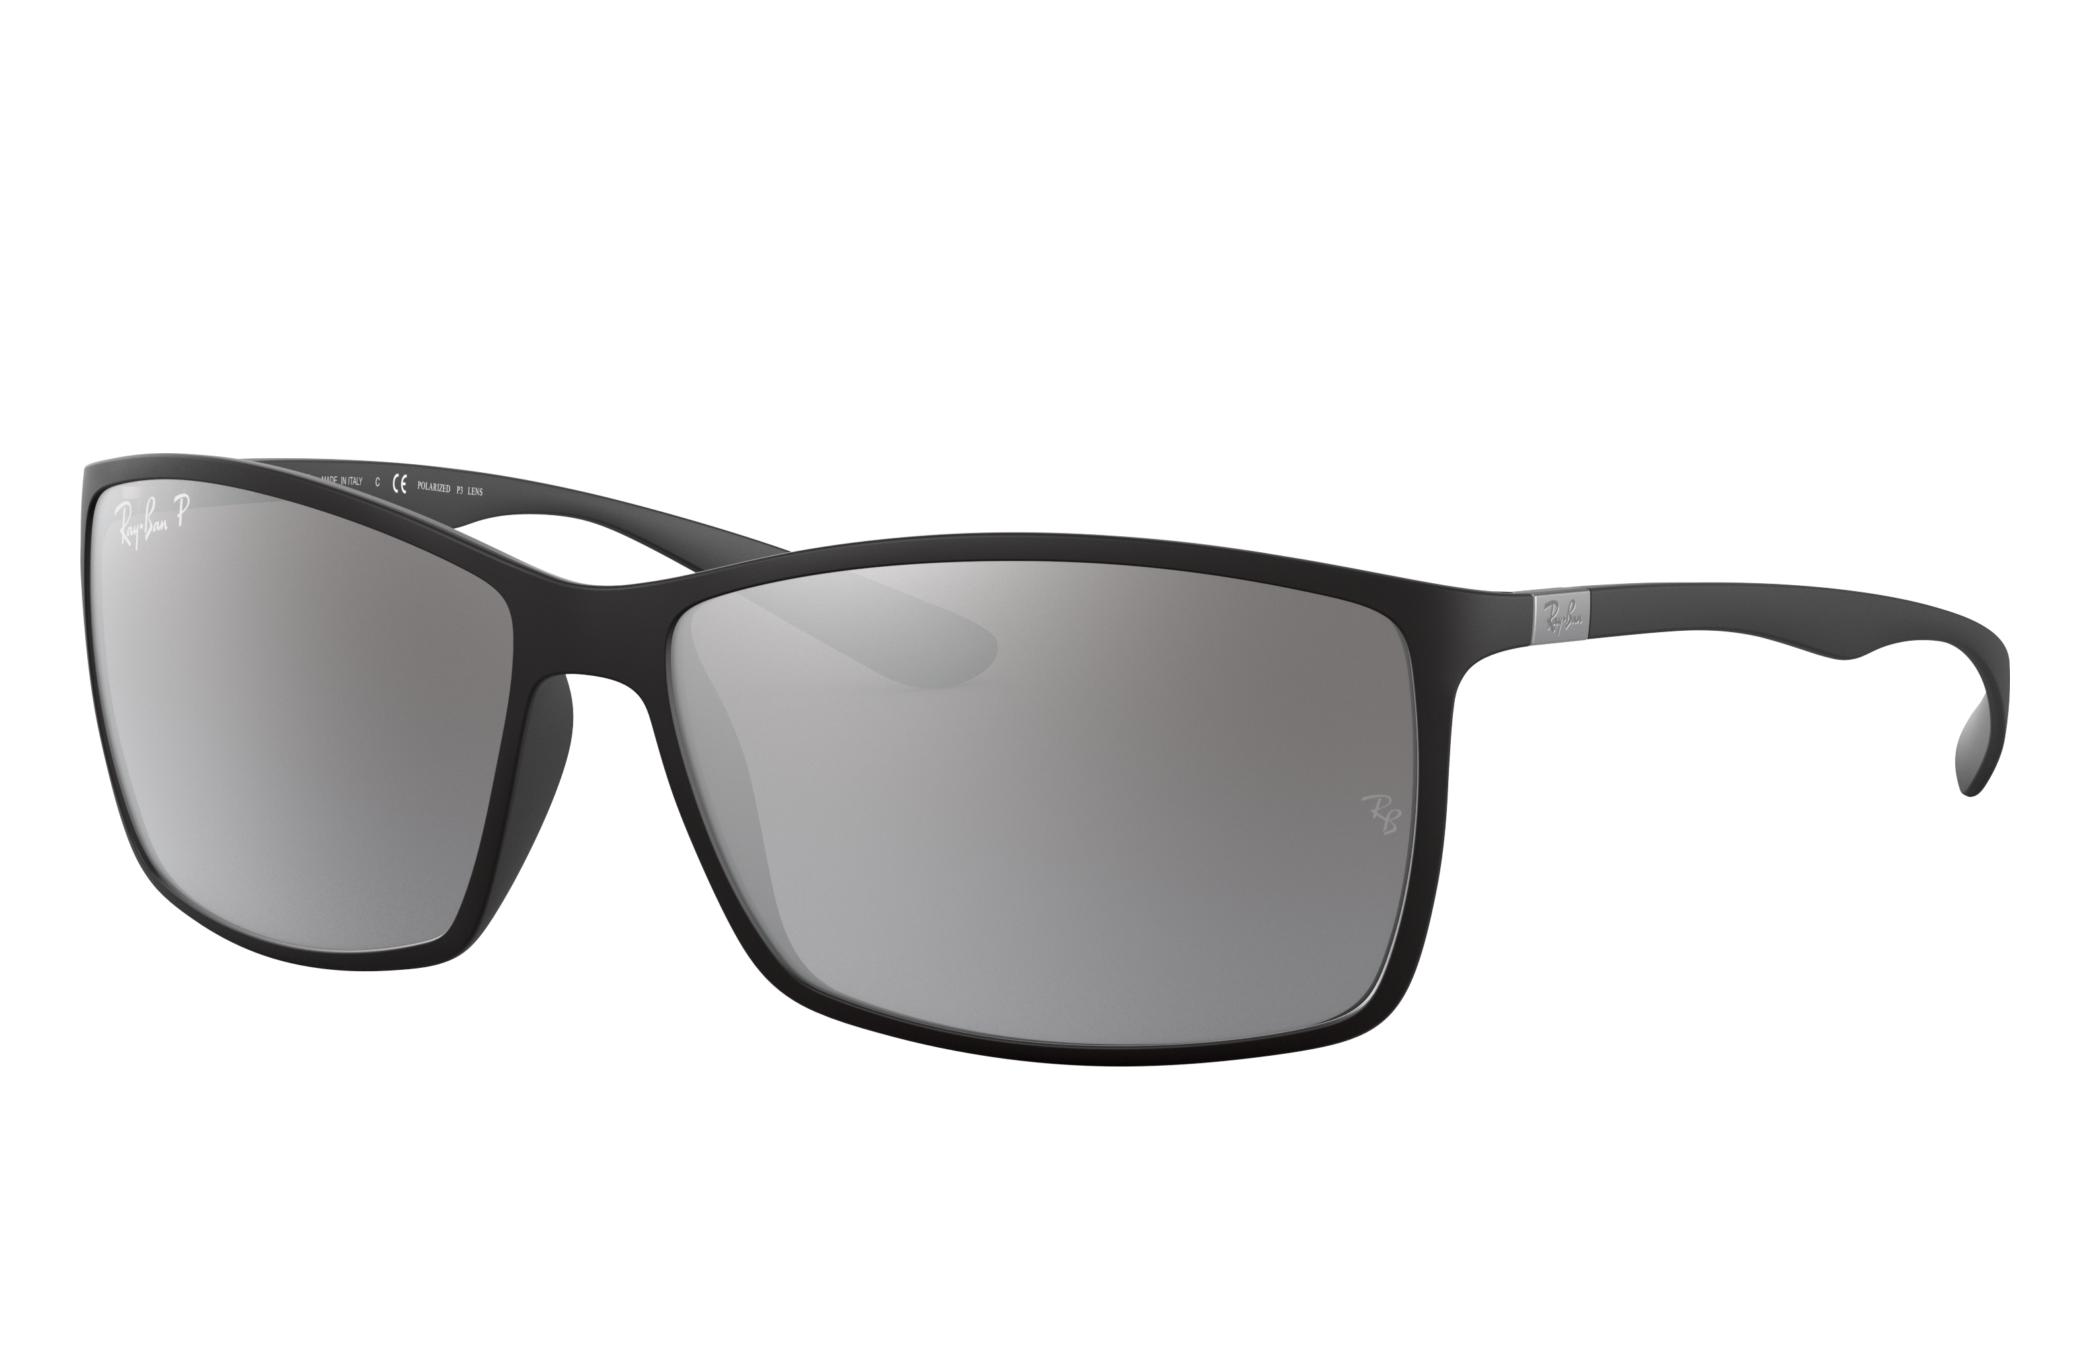 Ray-Ban Rb4179 Black, Polarized Gray Lenses - RB4179